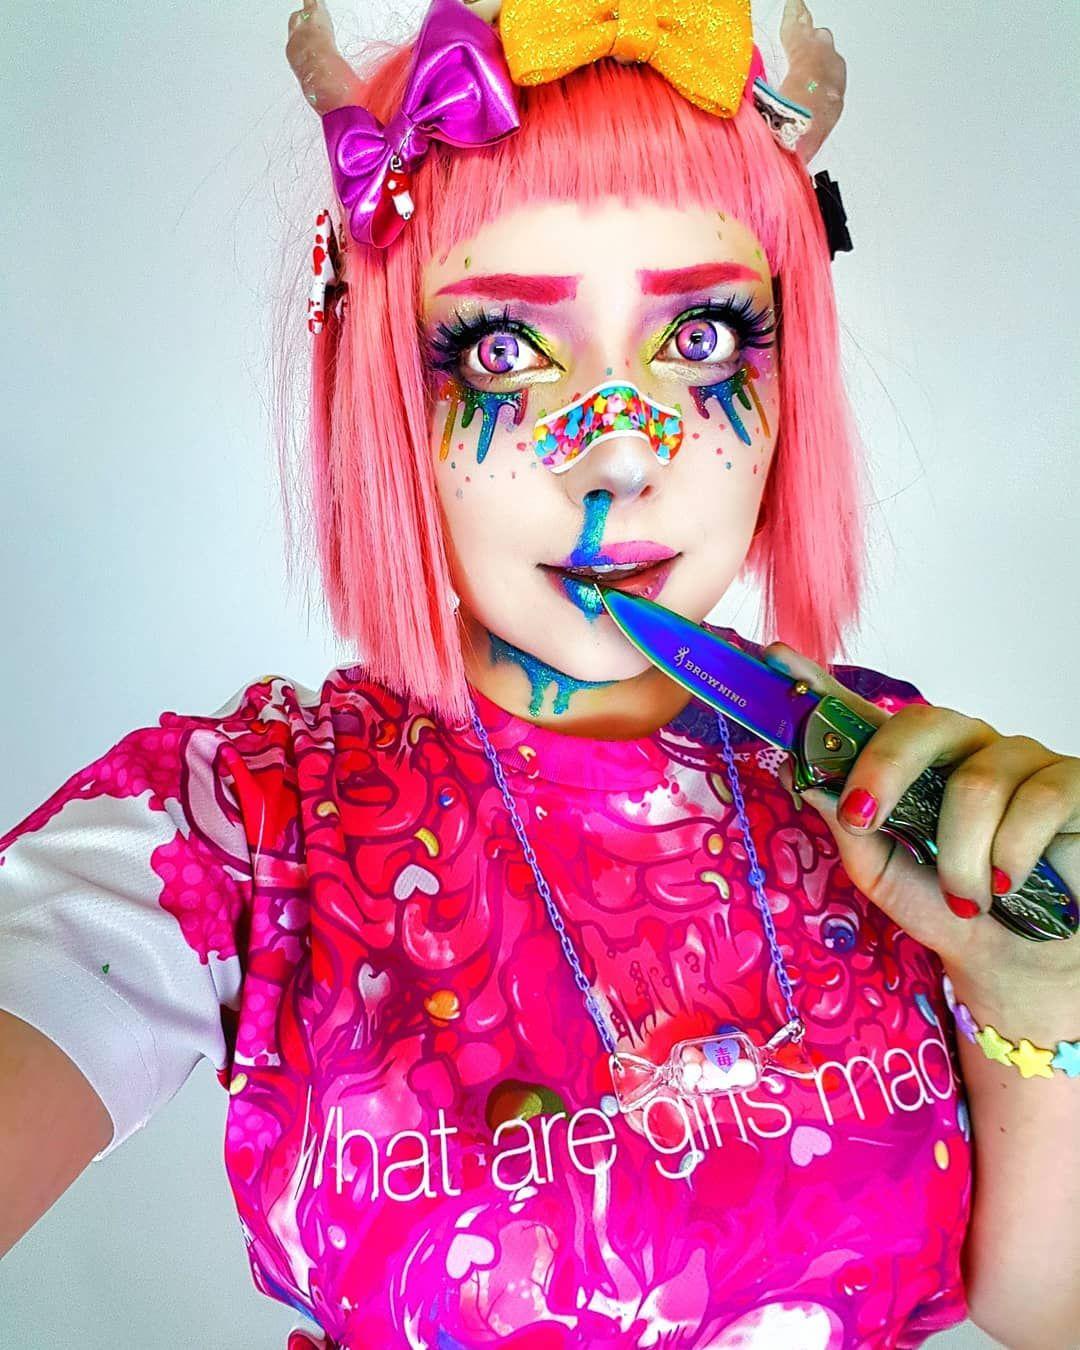 Preview Of A Super Fun Shoot With Wulfphotographyart Sugarpill Kawaiifashion Gurokawa Rainbowgore Candygore Decora See more ideas about candy gore, furry art, art inspiration. sugarpill kawaiifashion gurokawa